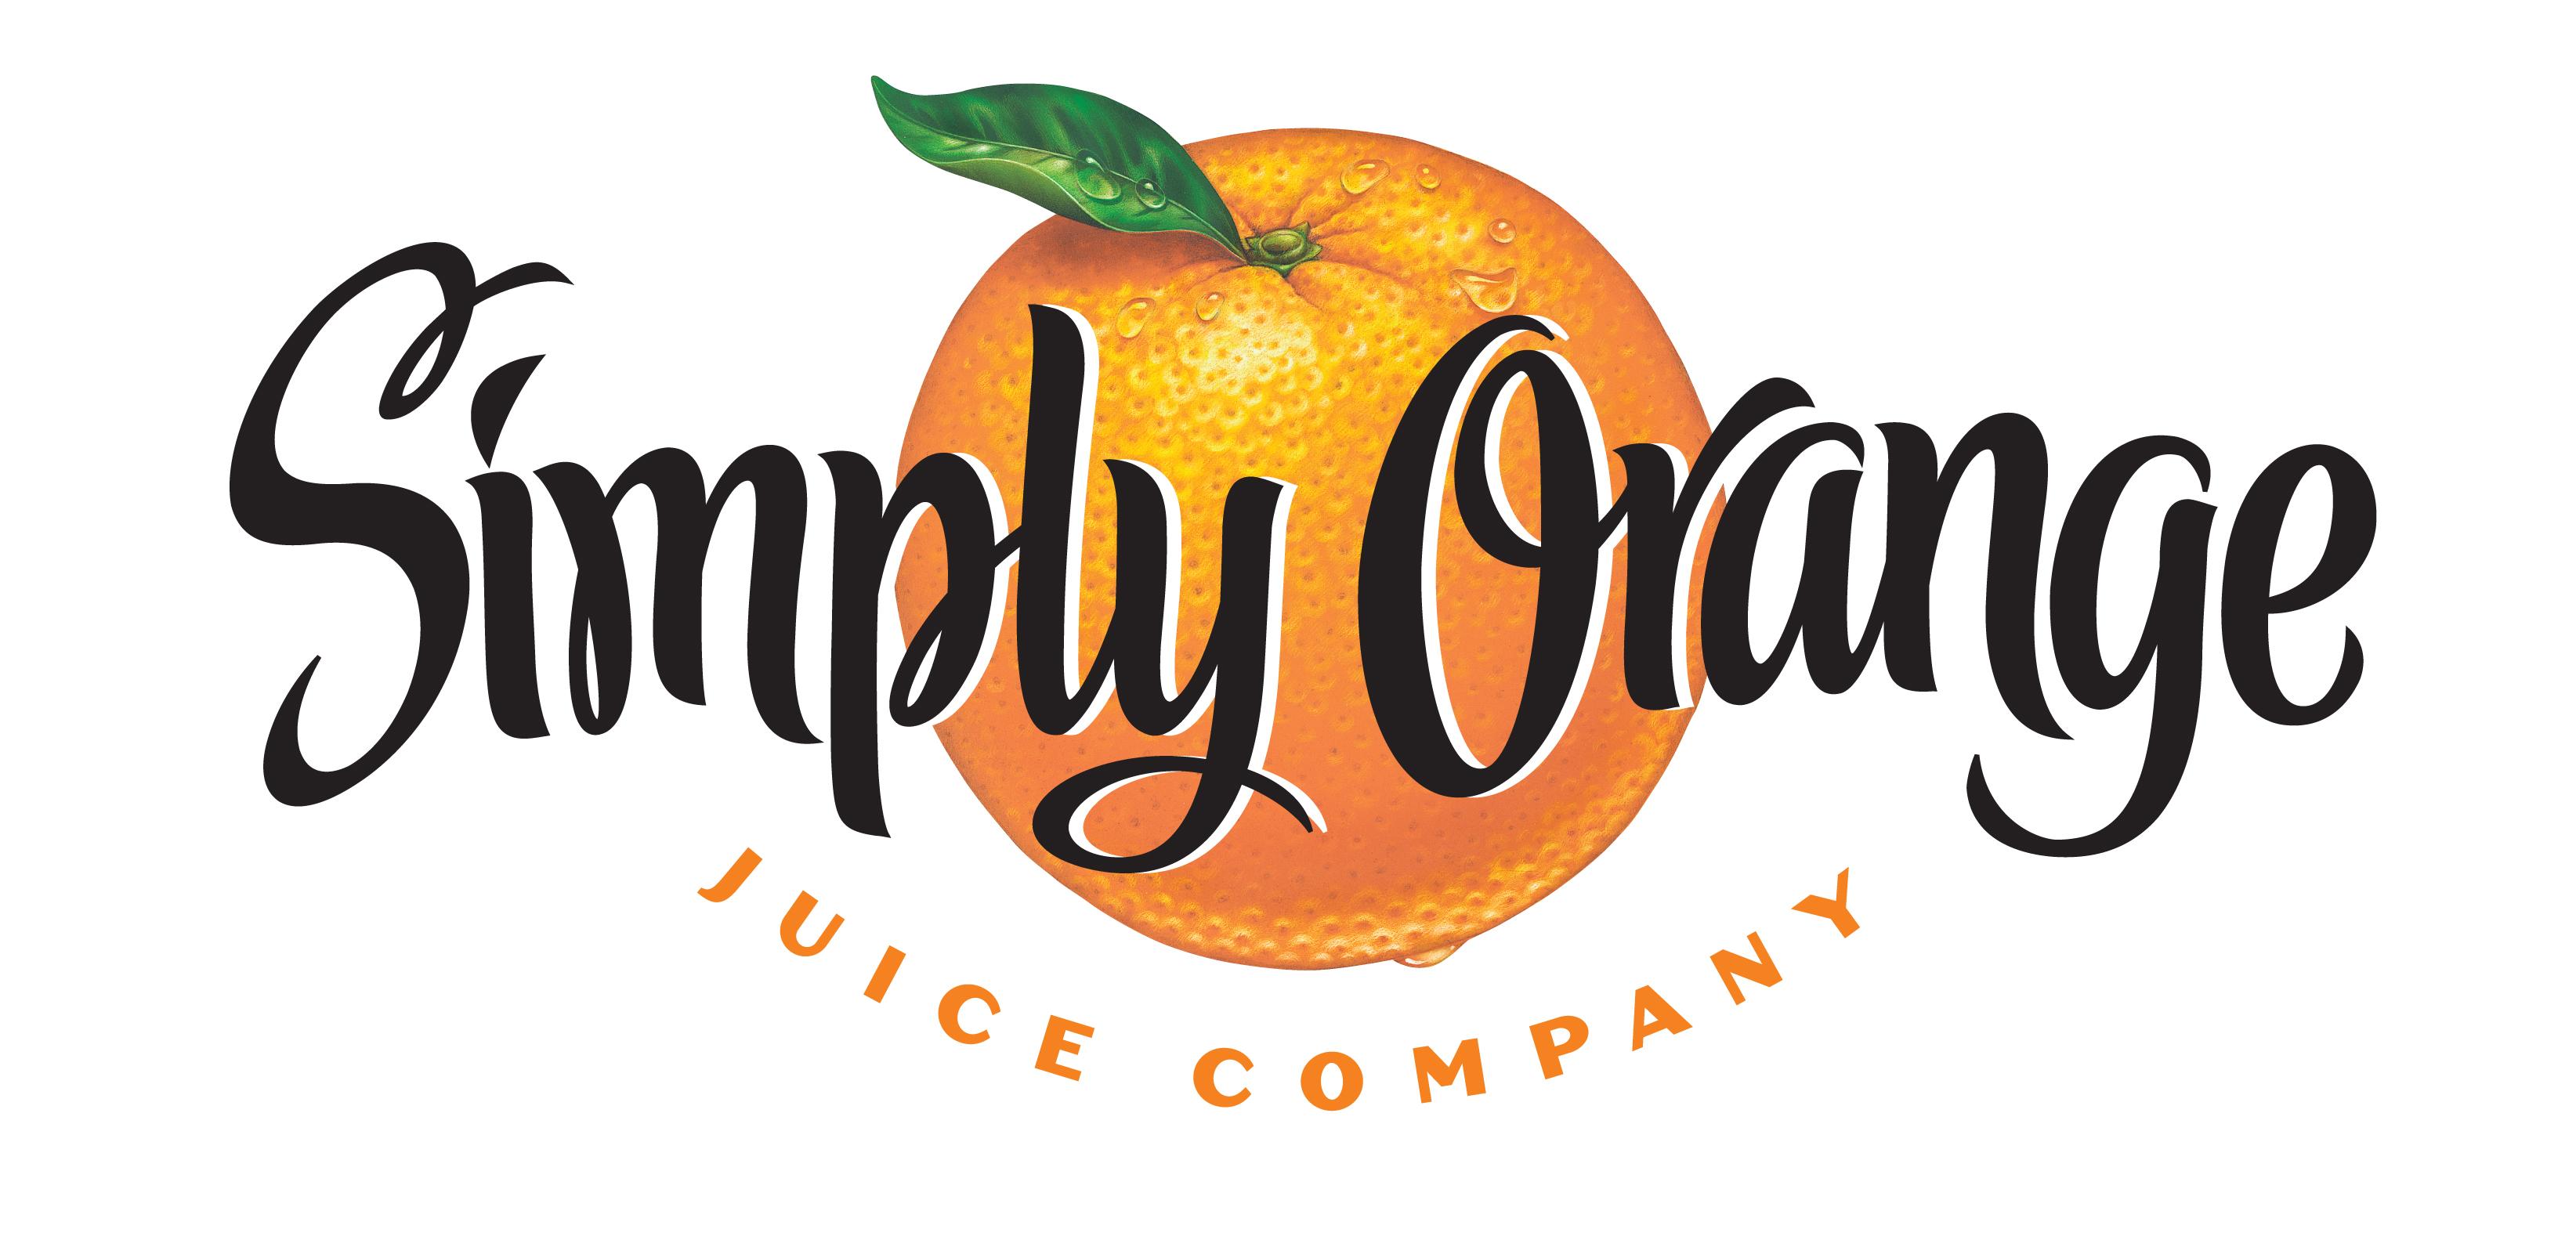 Simply Orange Juice Logo free image